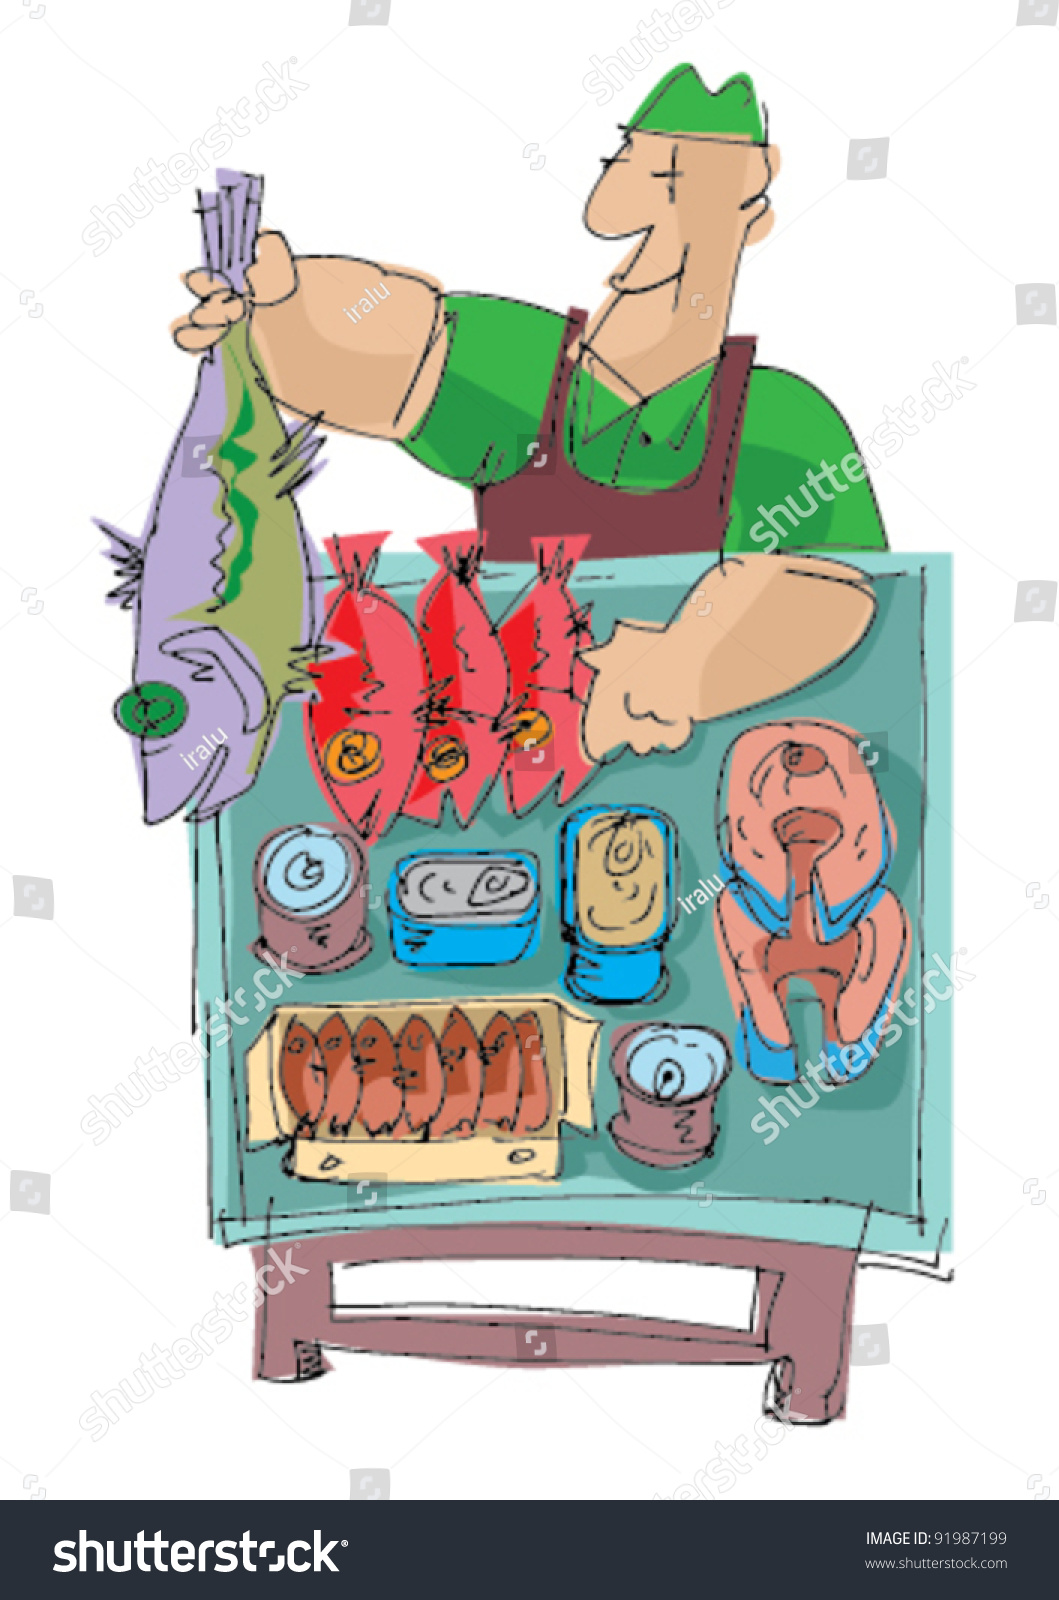 Fish Market Cartoon Stock Vector Illustration 91987199